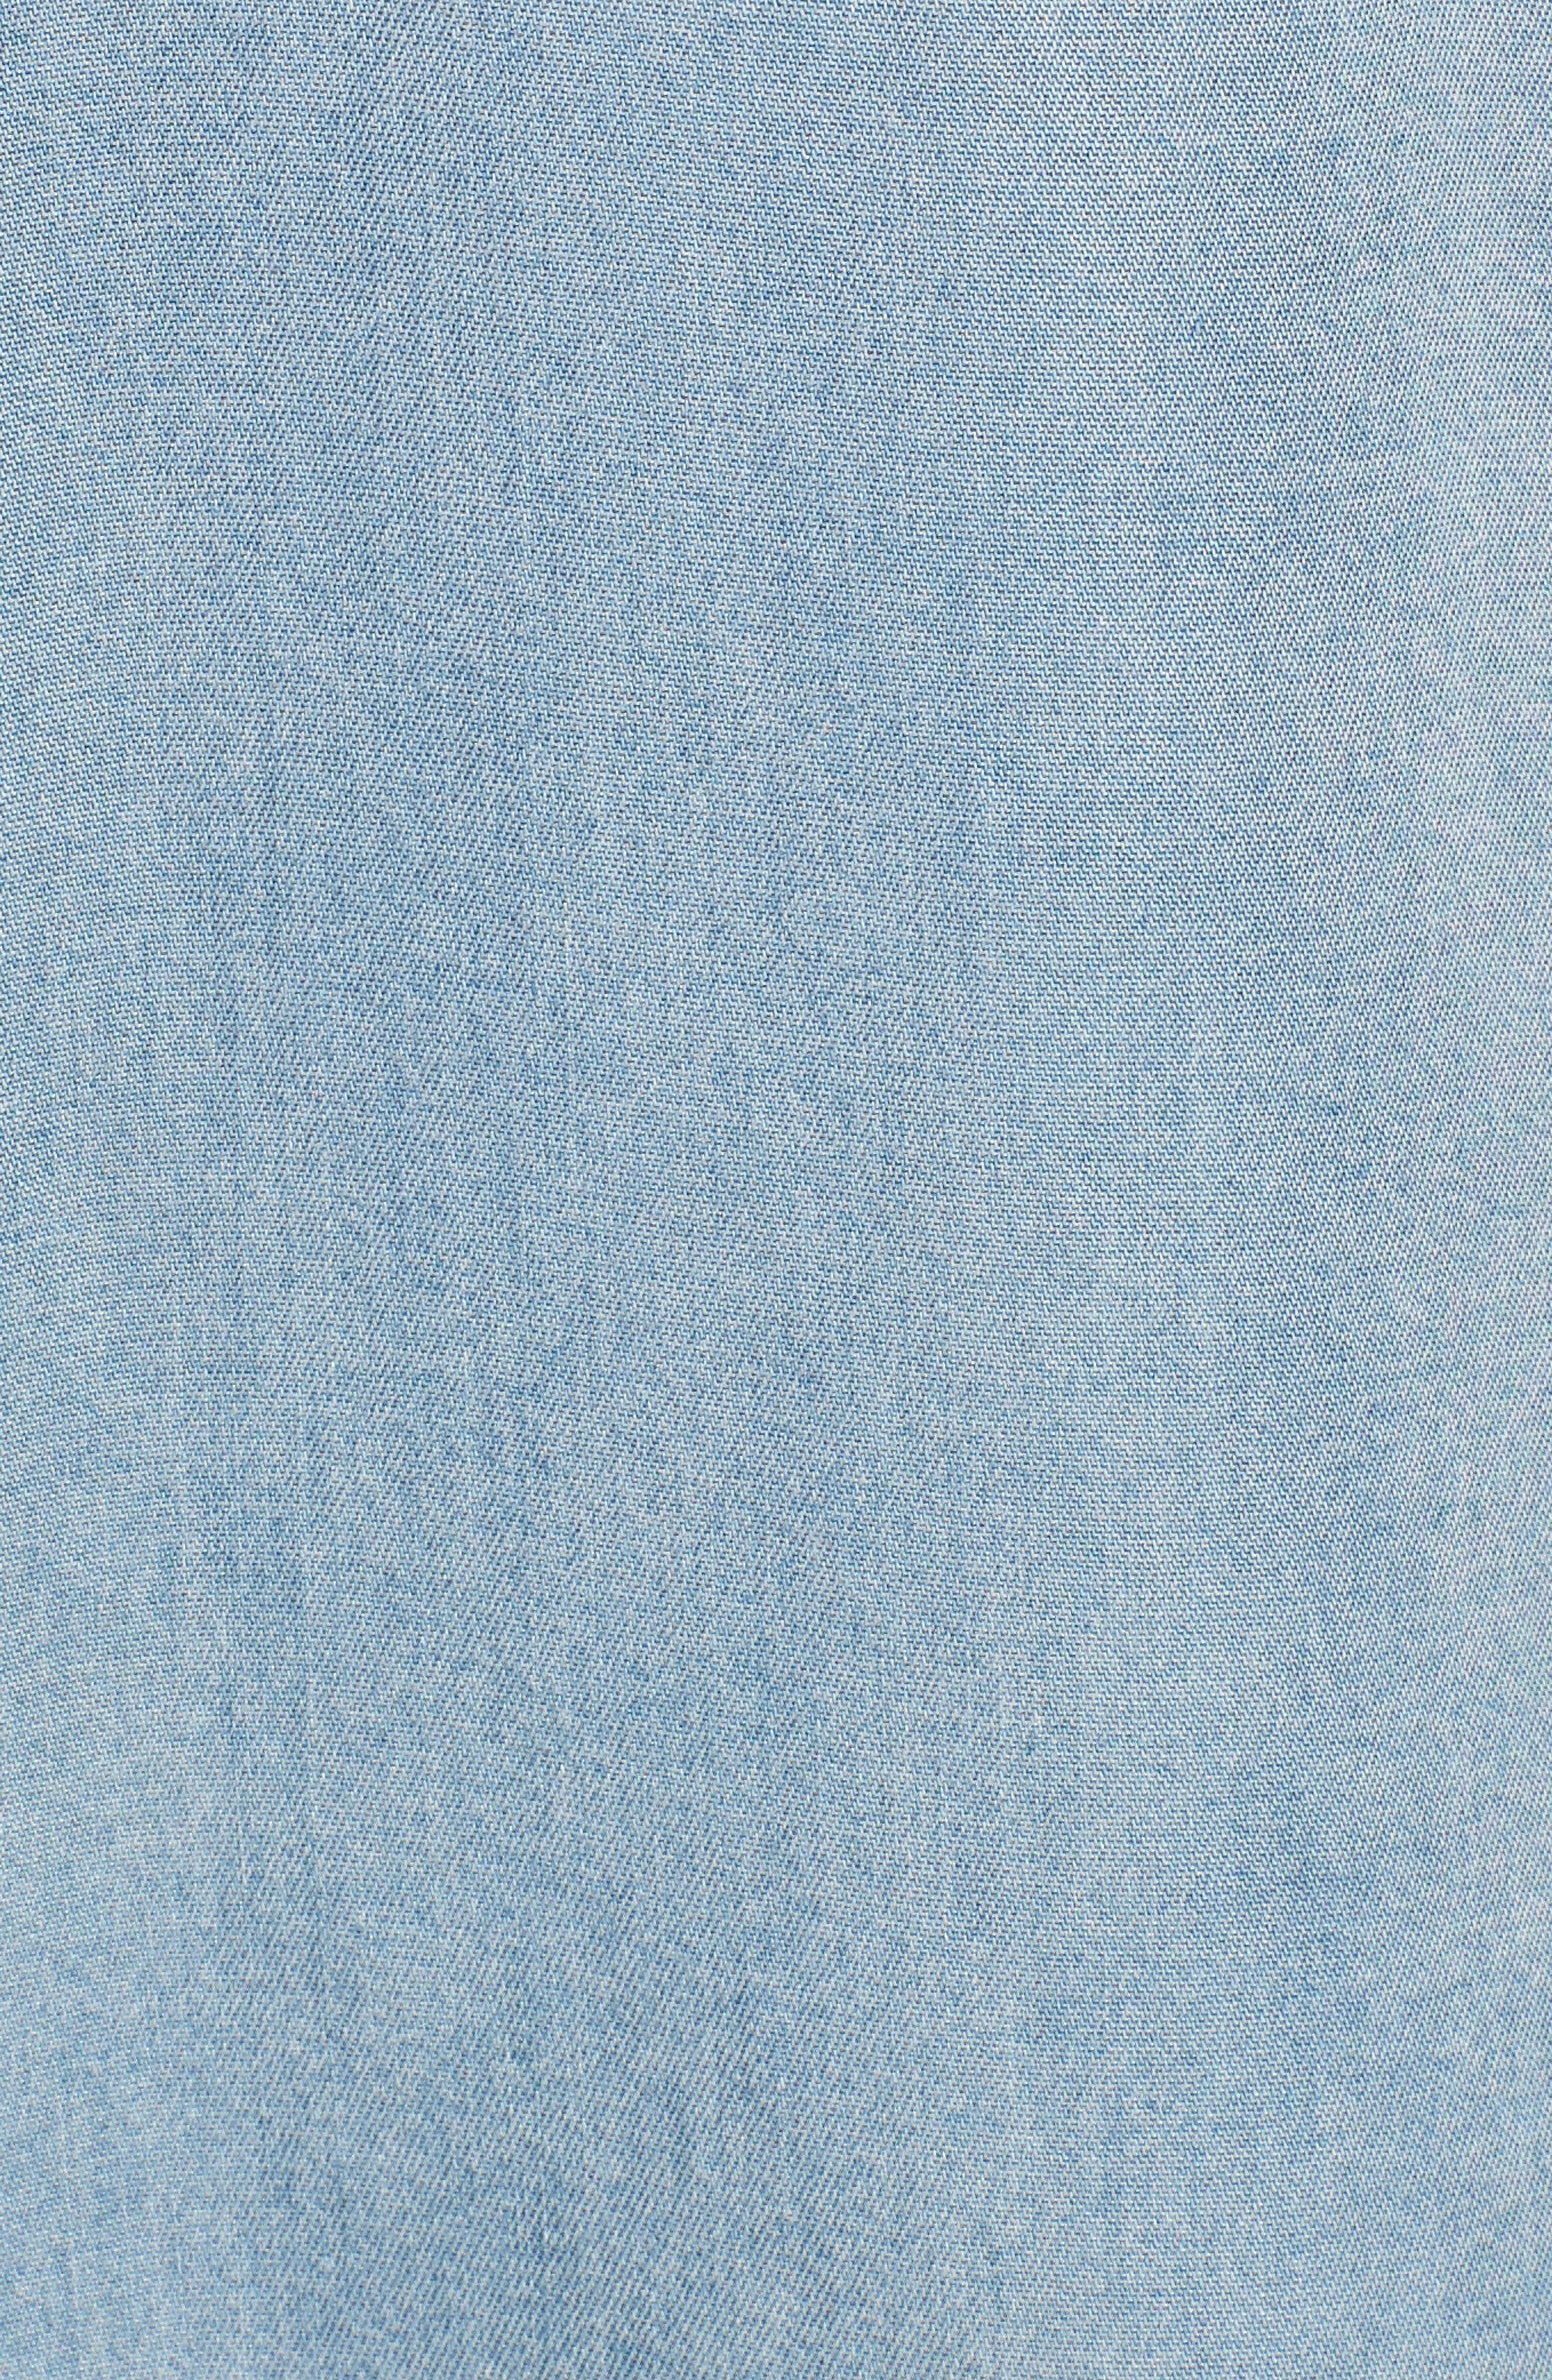 Alternate Image 5  - DL1961 x The Blue Shirt Shop Nassau & Manhattan Boyfriend Shirt